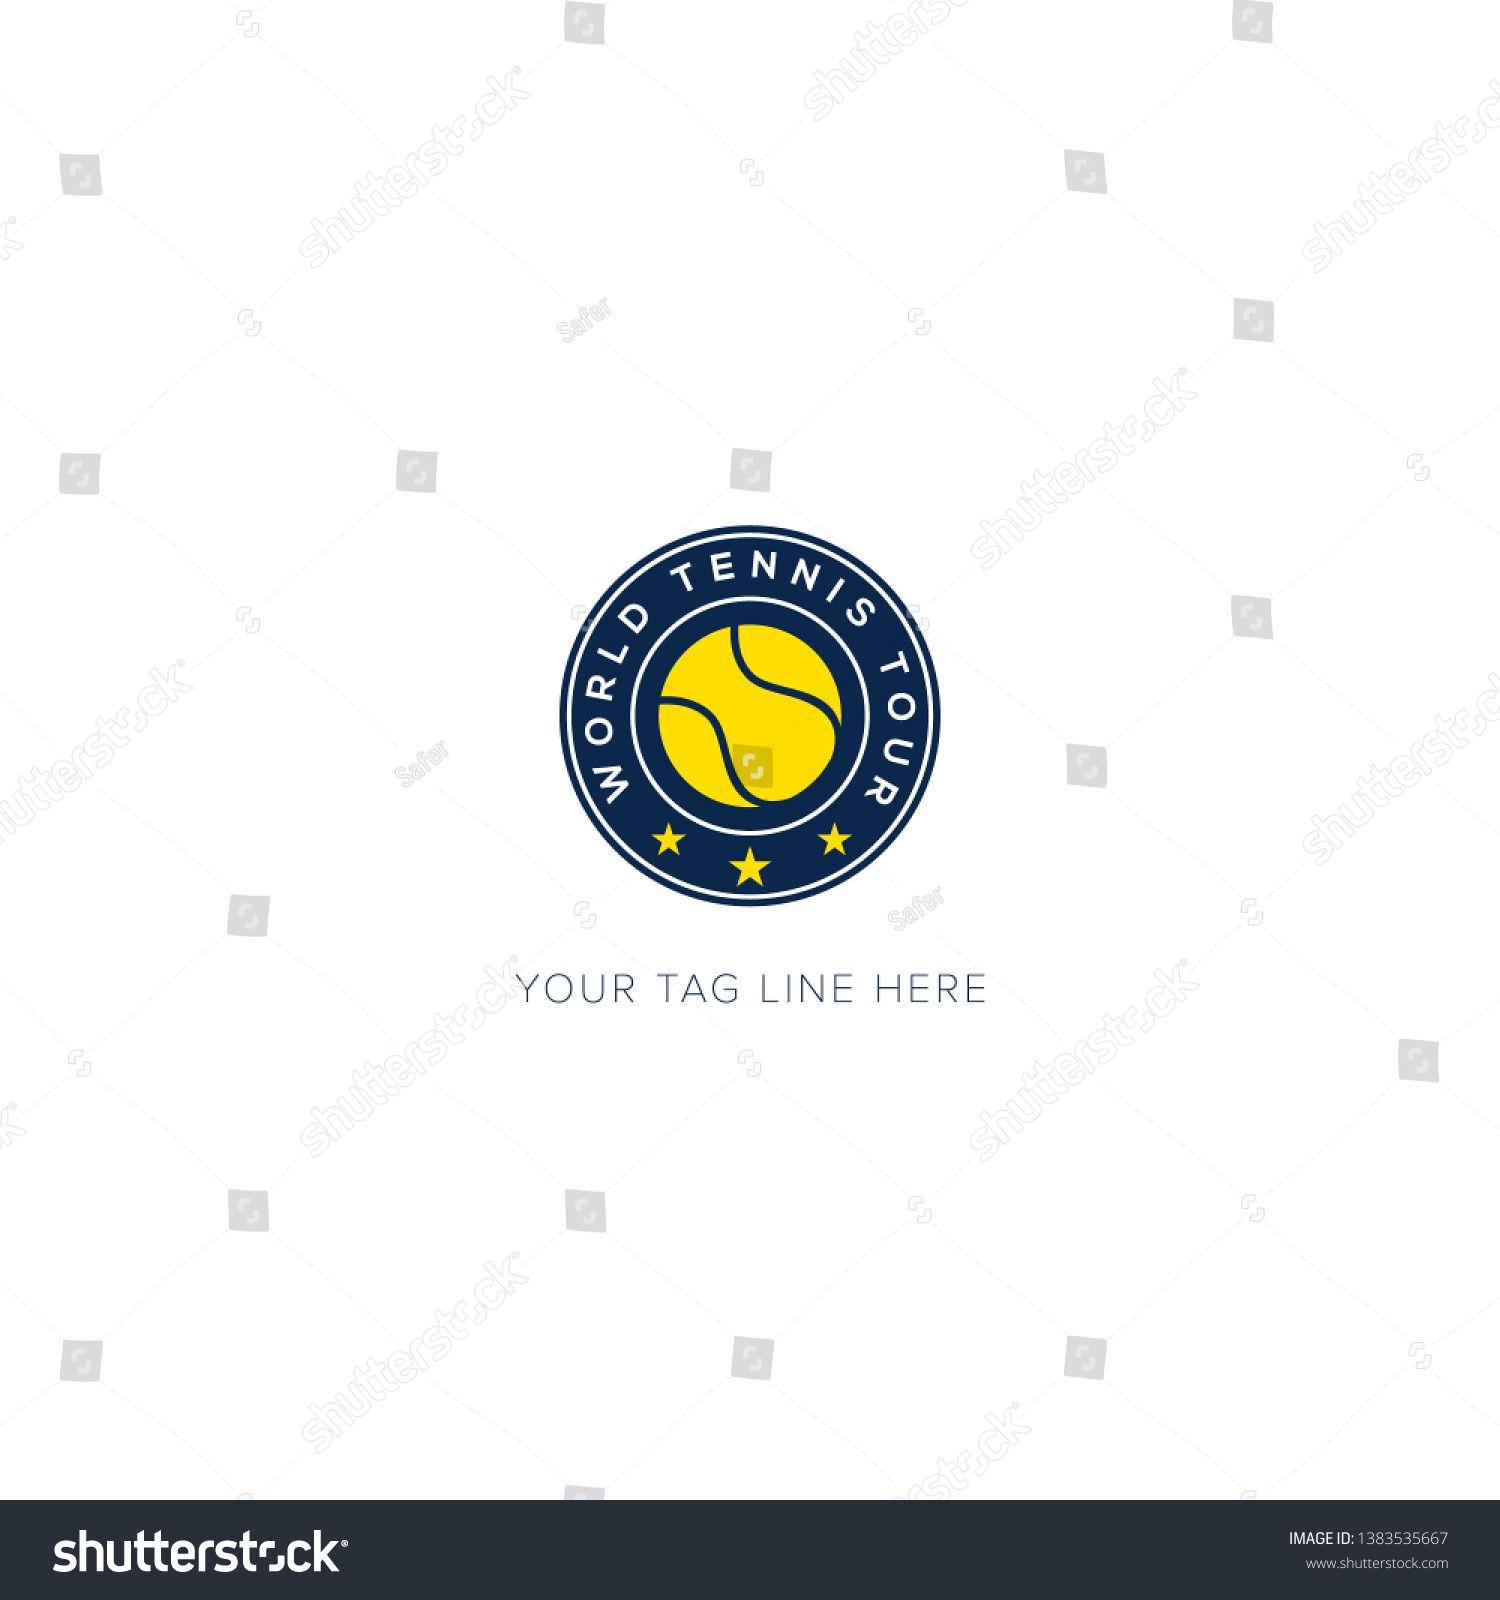 Sports Logo For World Tennis Logo Design Ad Ad Logo Sports World Design Logo Design Business Card Modern Design